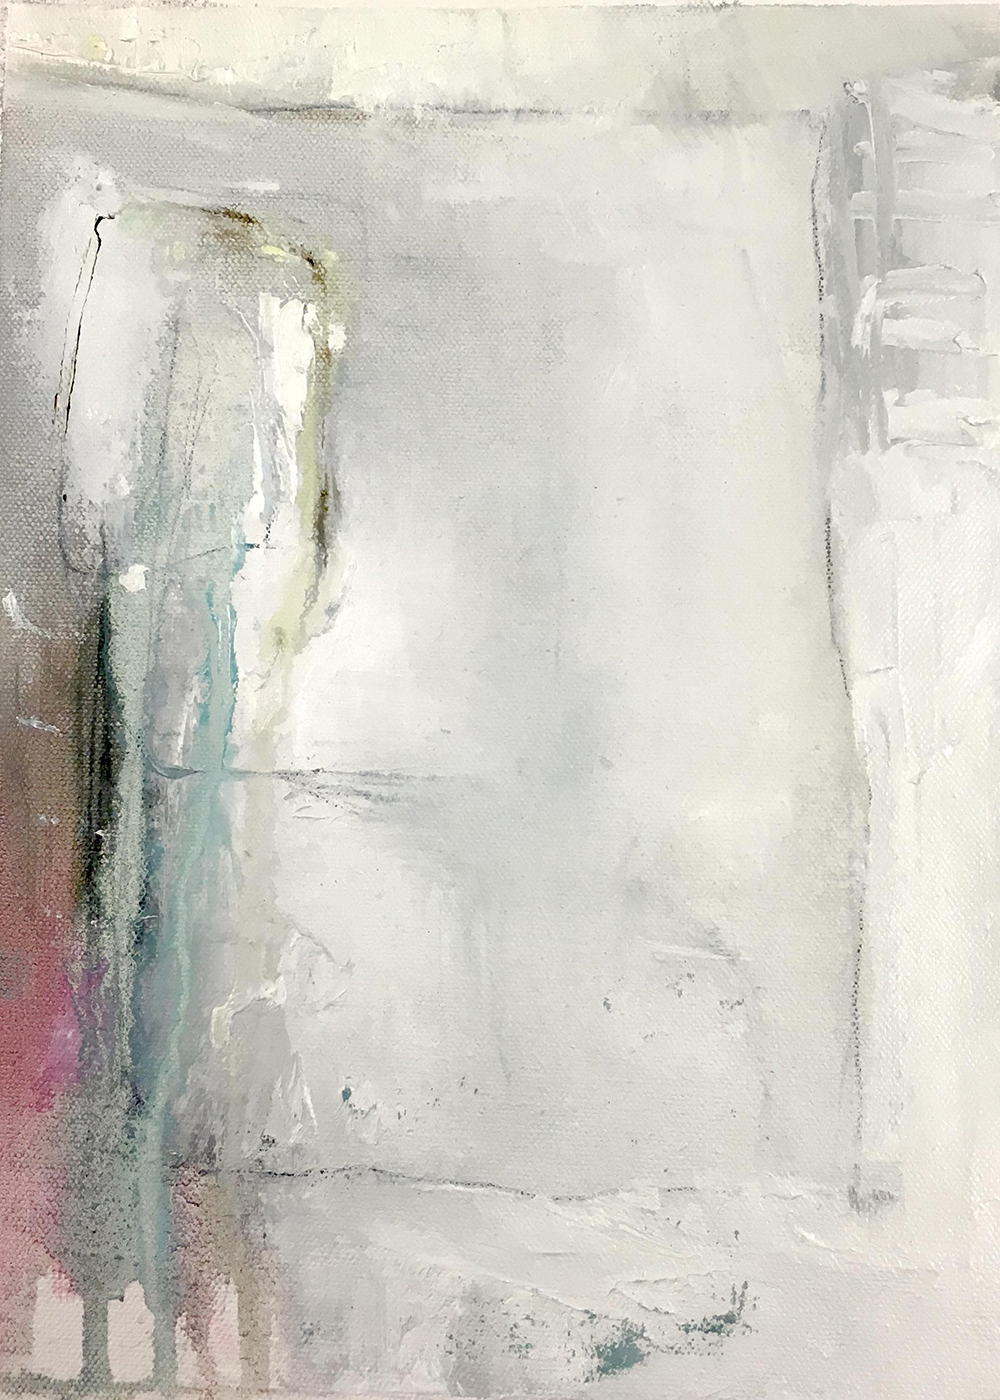 IAYSHA SALIH, Inside Out